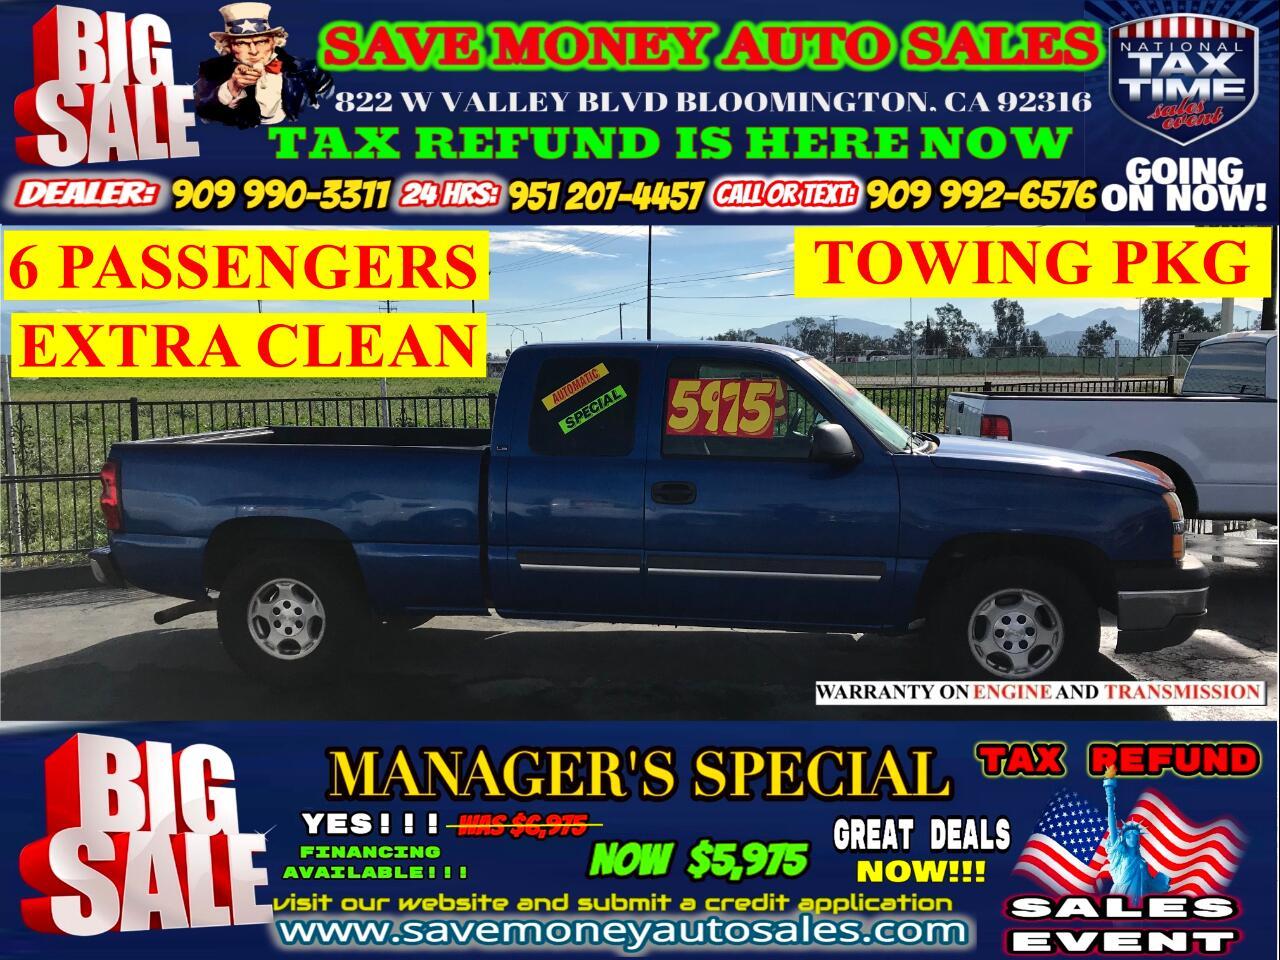 2004 Chevrolet Silverado 1500 LS EXT. CAB LONG BED 2WD> TOWING PKG> 6 PASSENGERS